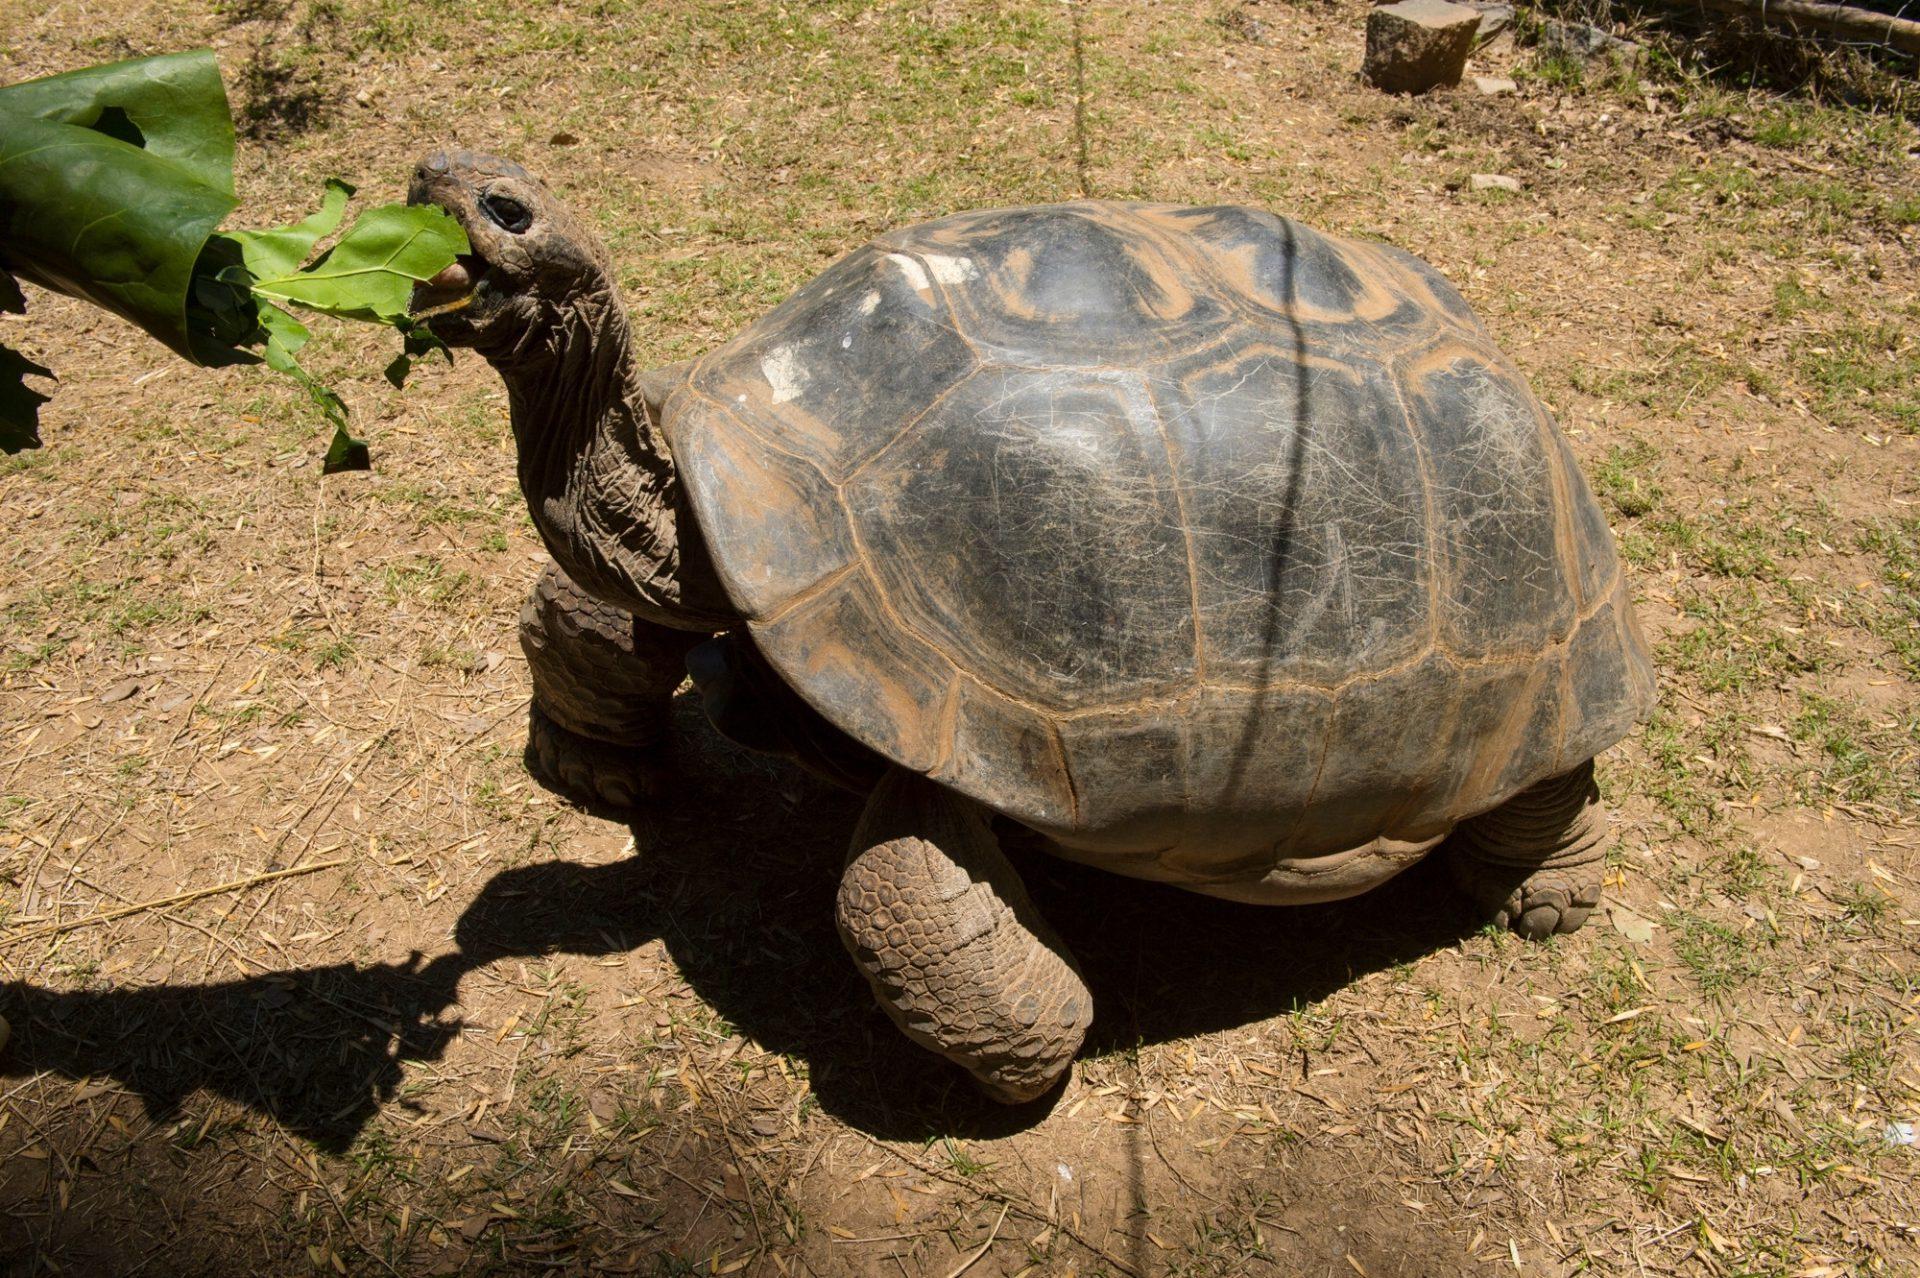 Photo: An Aldabra giant tortoise, Aldabrachelys gigantea, at Tsimbazaza Zoo.